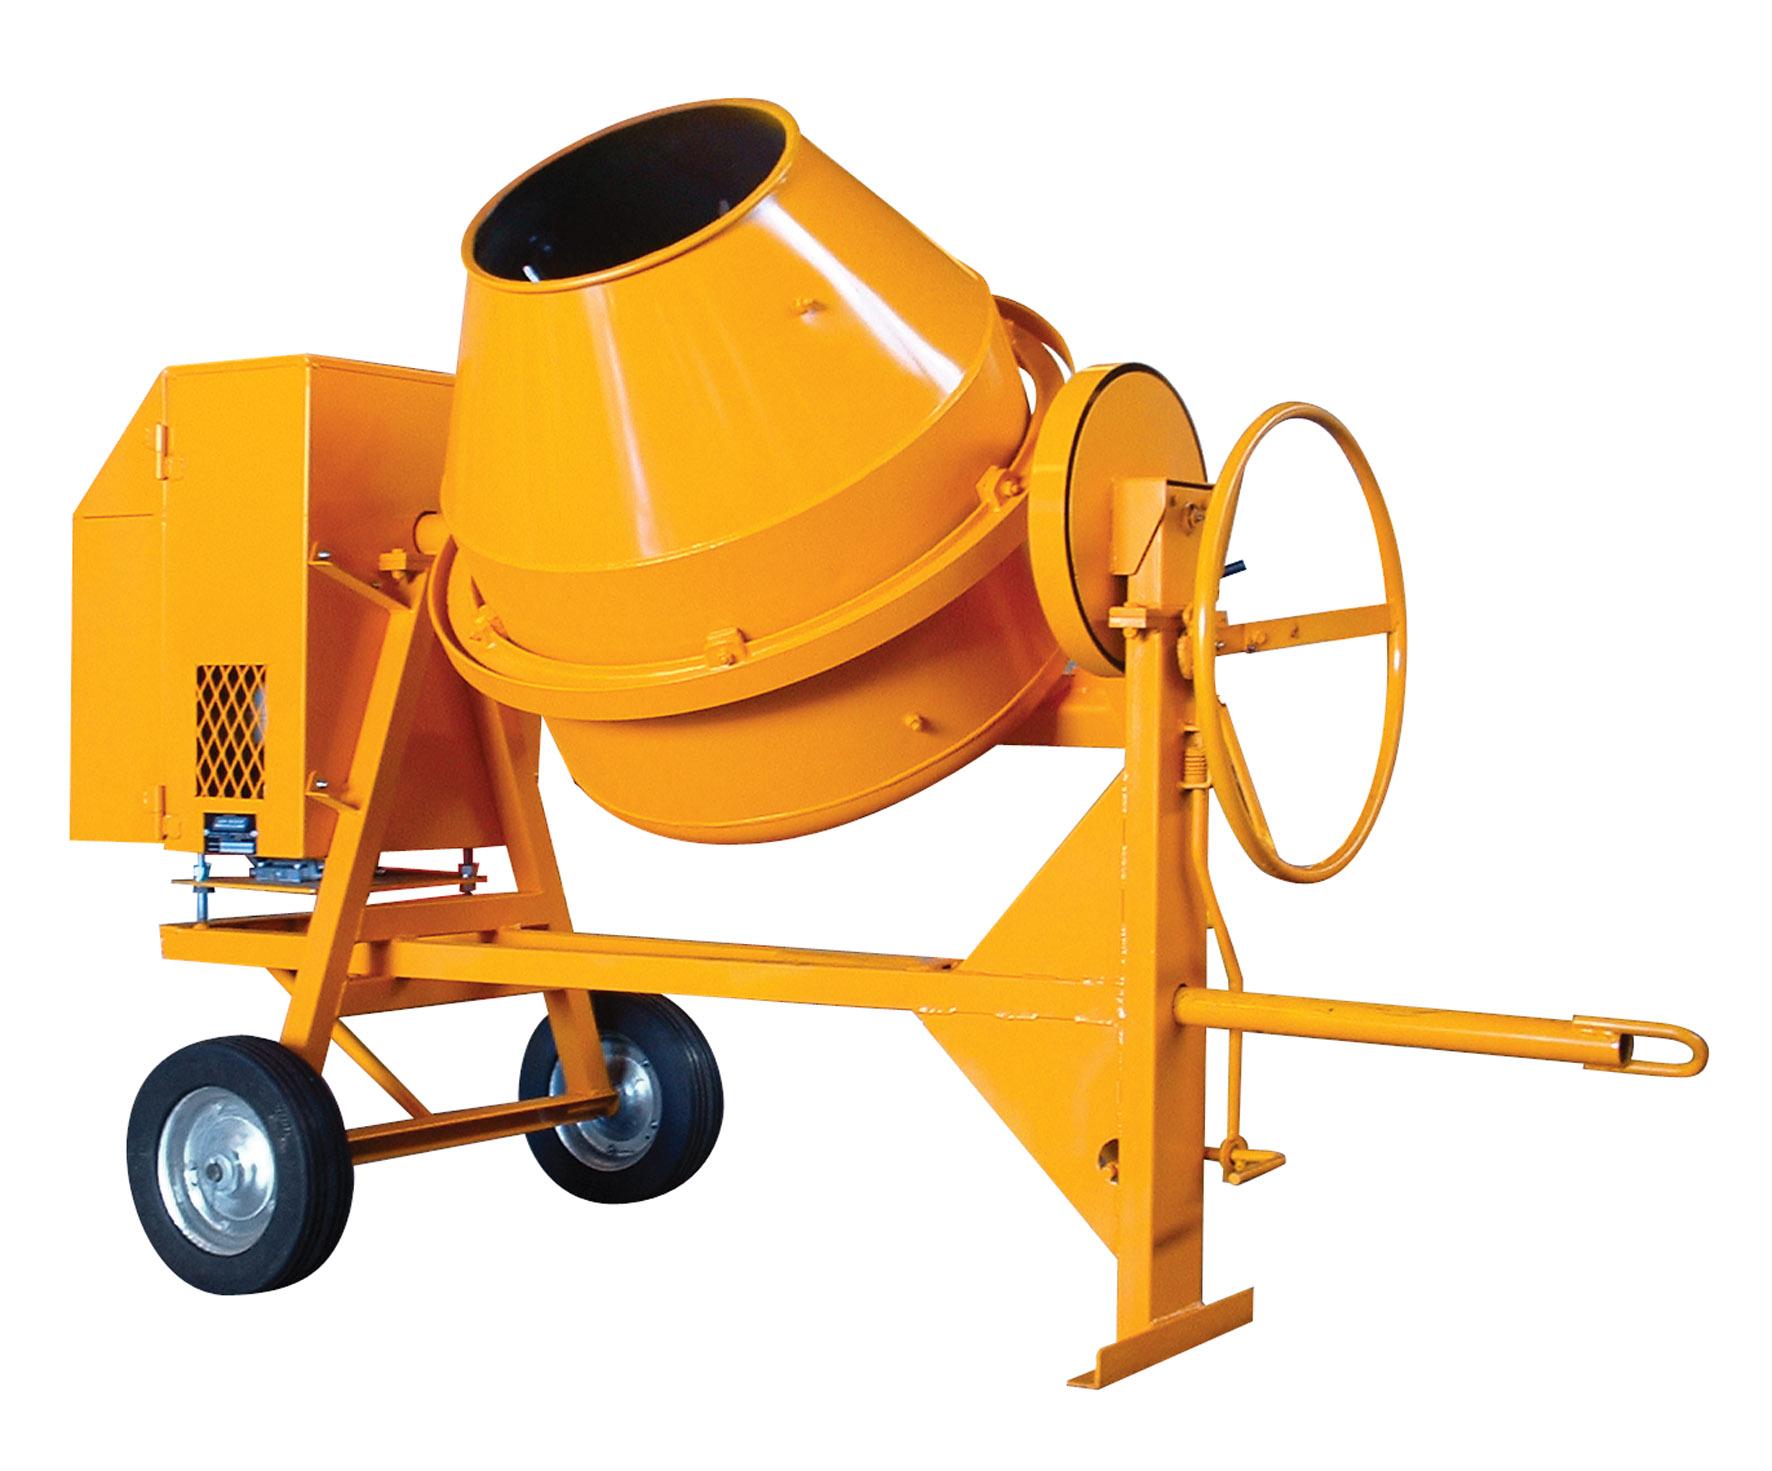 Medium Amp Heavy Duty Side Tilt Concrete Mixers Bm175